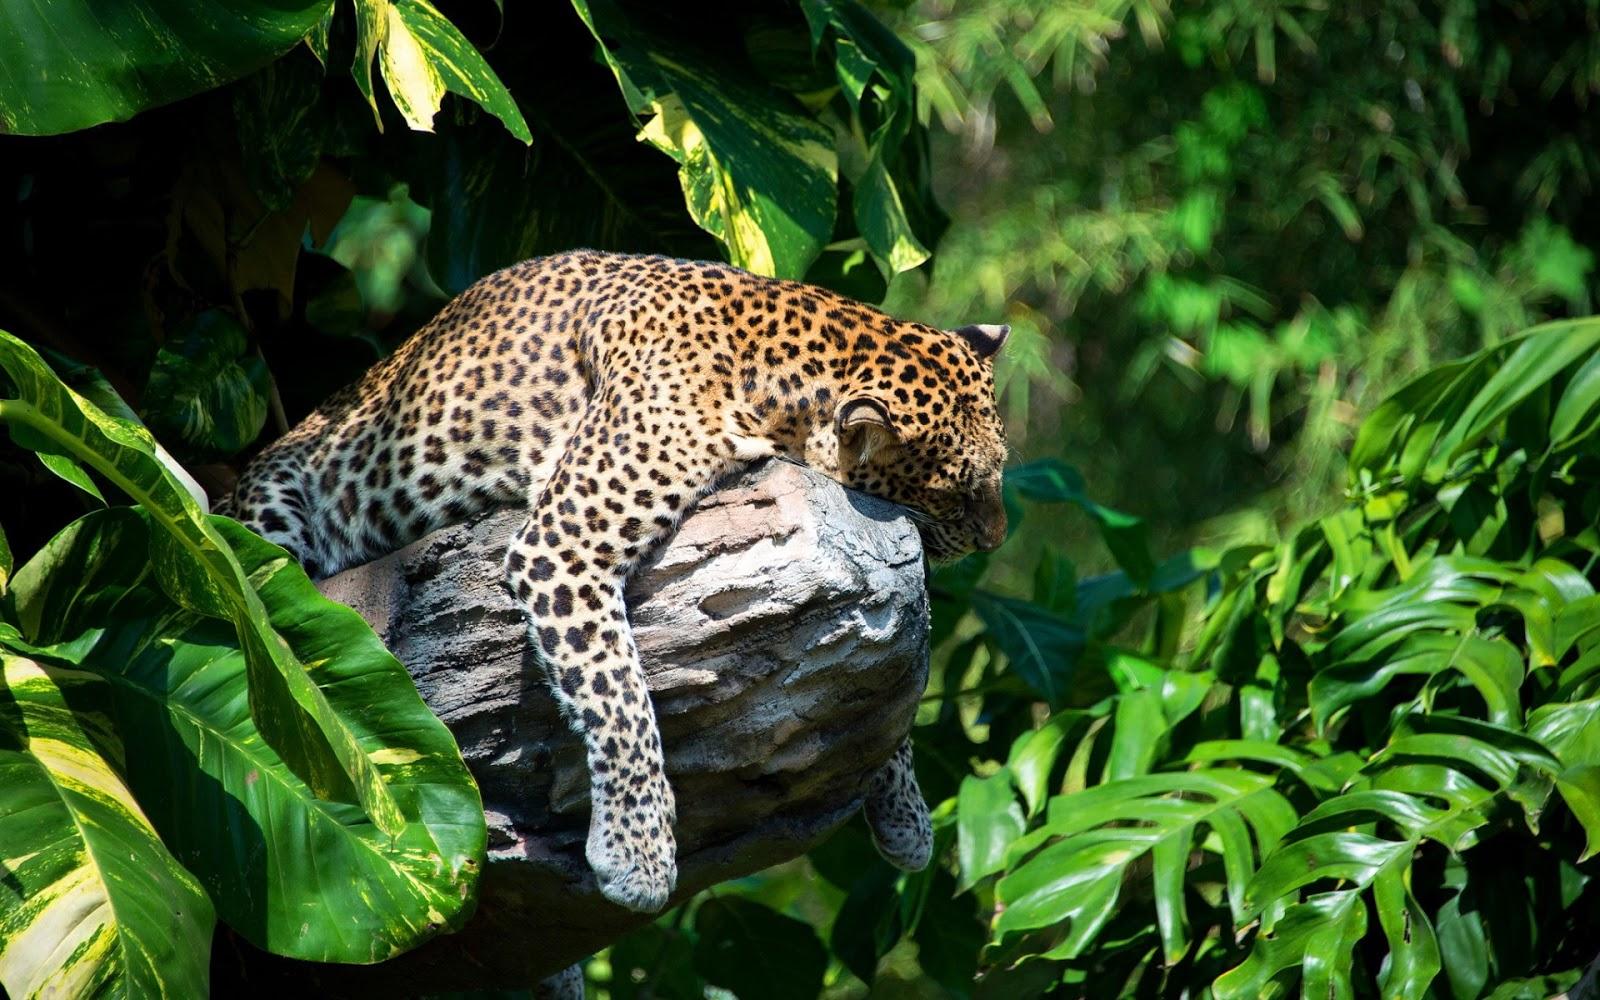 Fondo De Pantalla De Leopardo Fondos De Pantalla Gratis: Fondos HD Wallpapers: Fondo De Pantalla Animales Leopardo